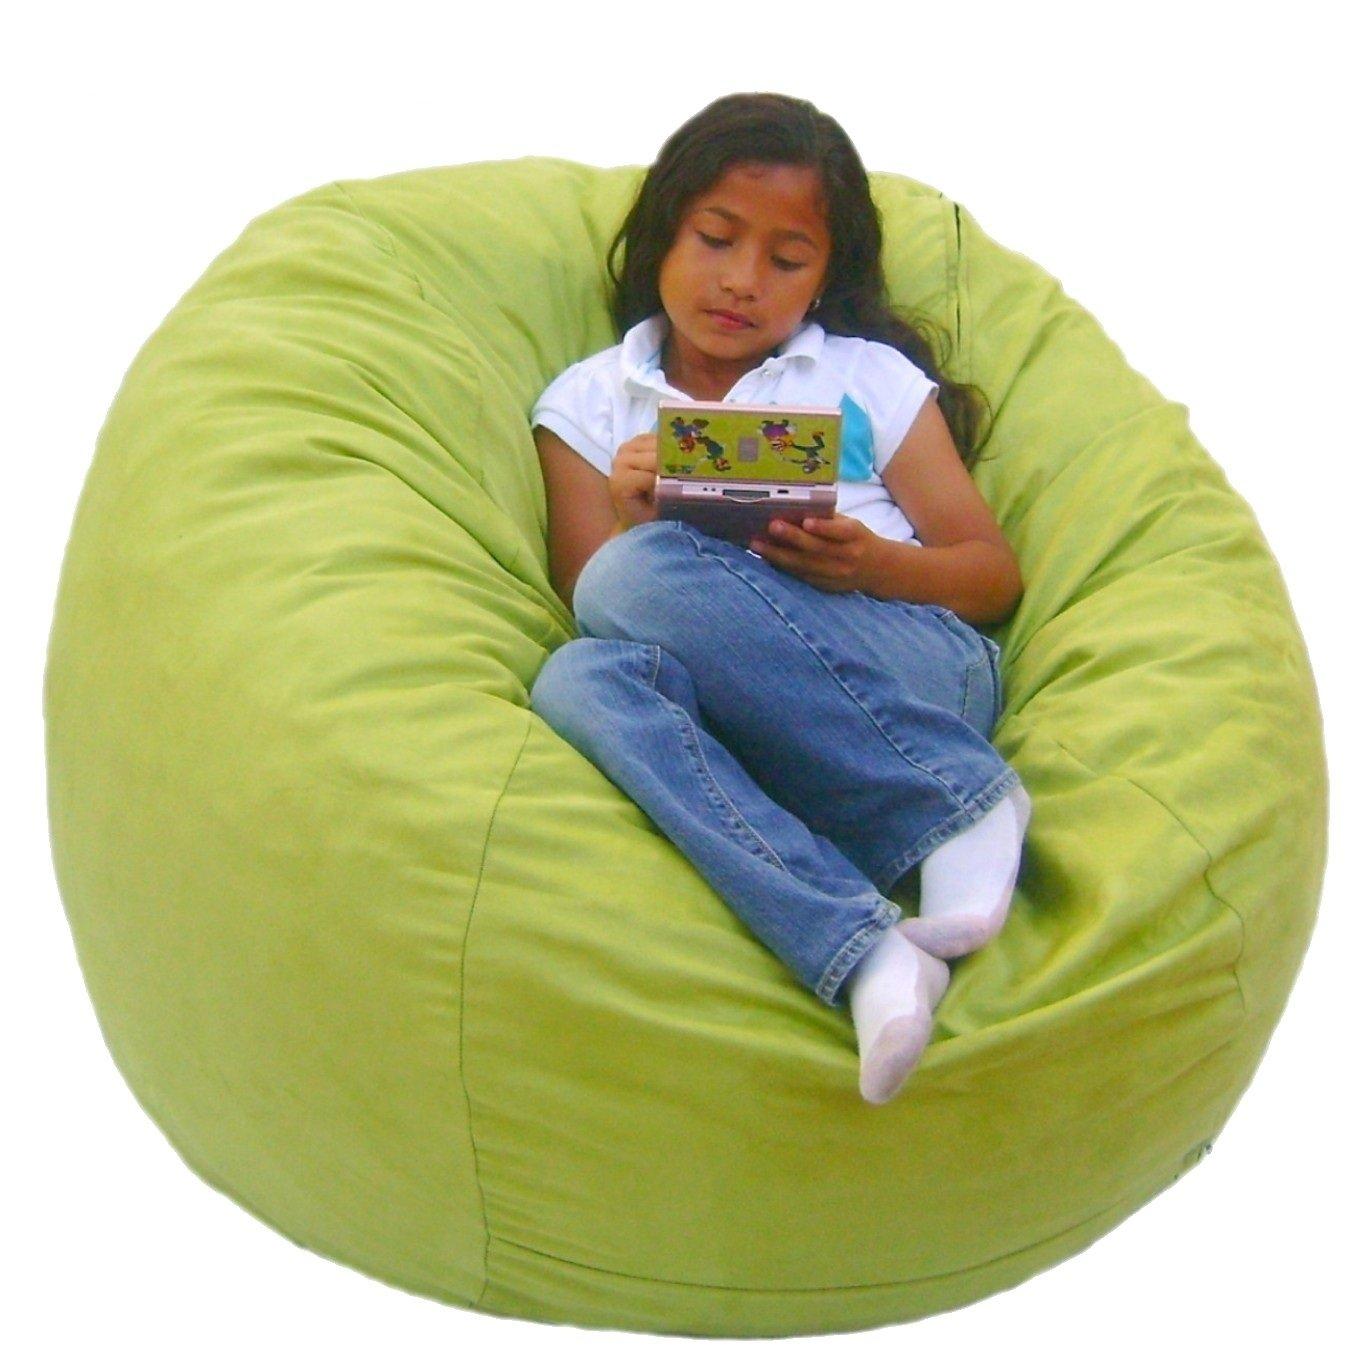 Cozy Sack 3-Feet Bean Bag Chair, Medium, Lime by Cozy Sack (Image #1)